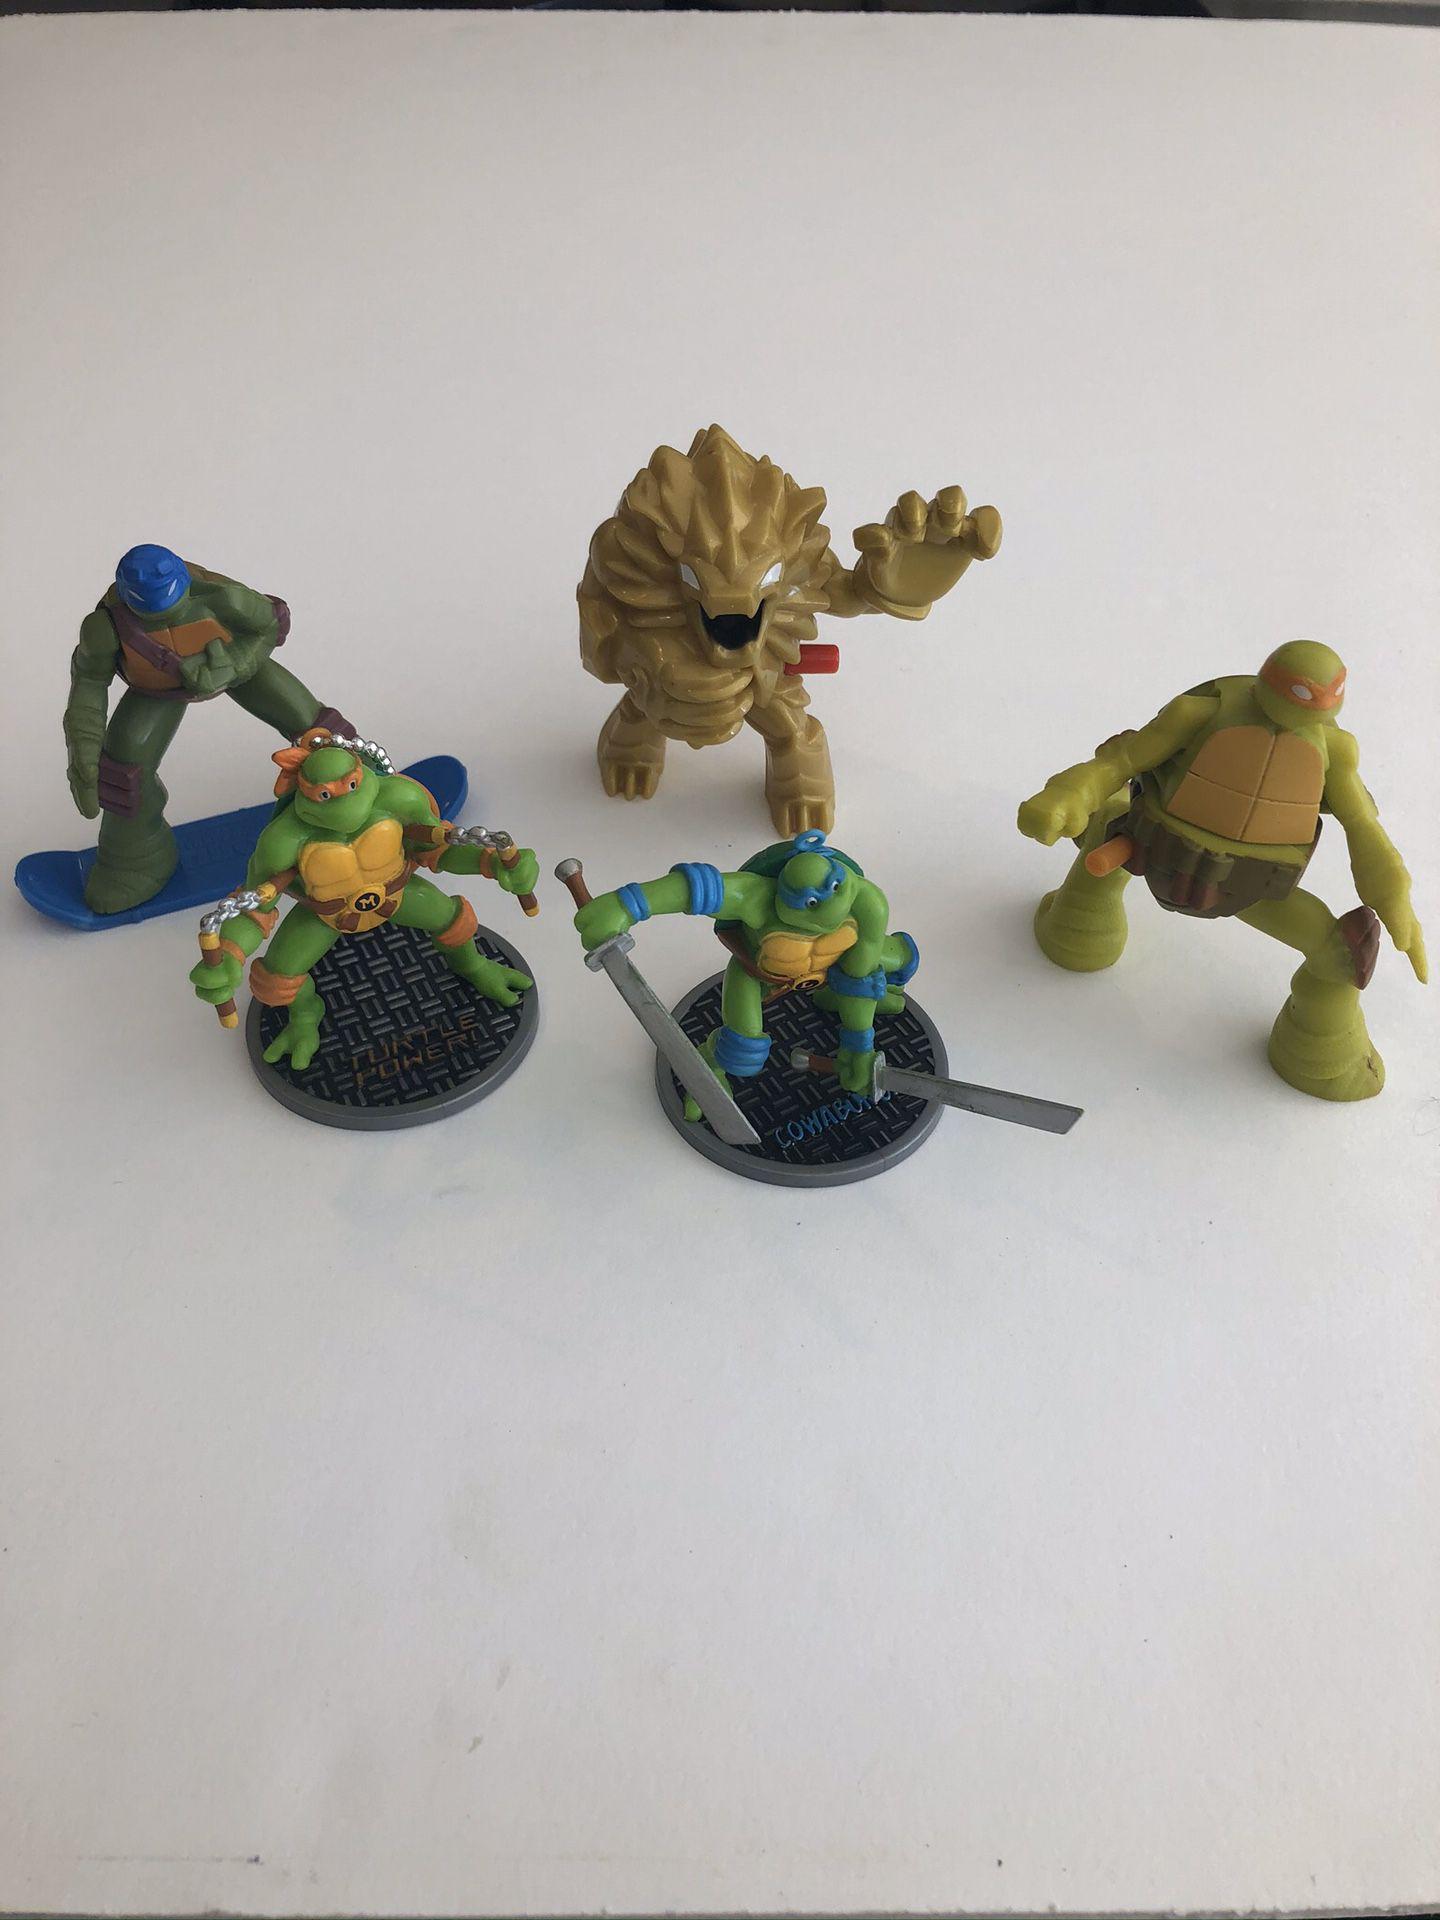 Ninja turtles figurines set of 5 action figures, Free Shipping